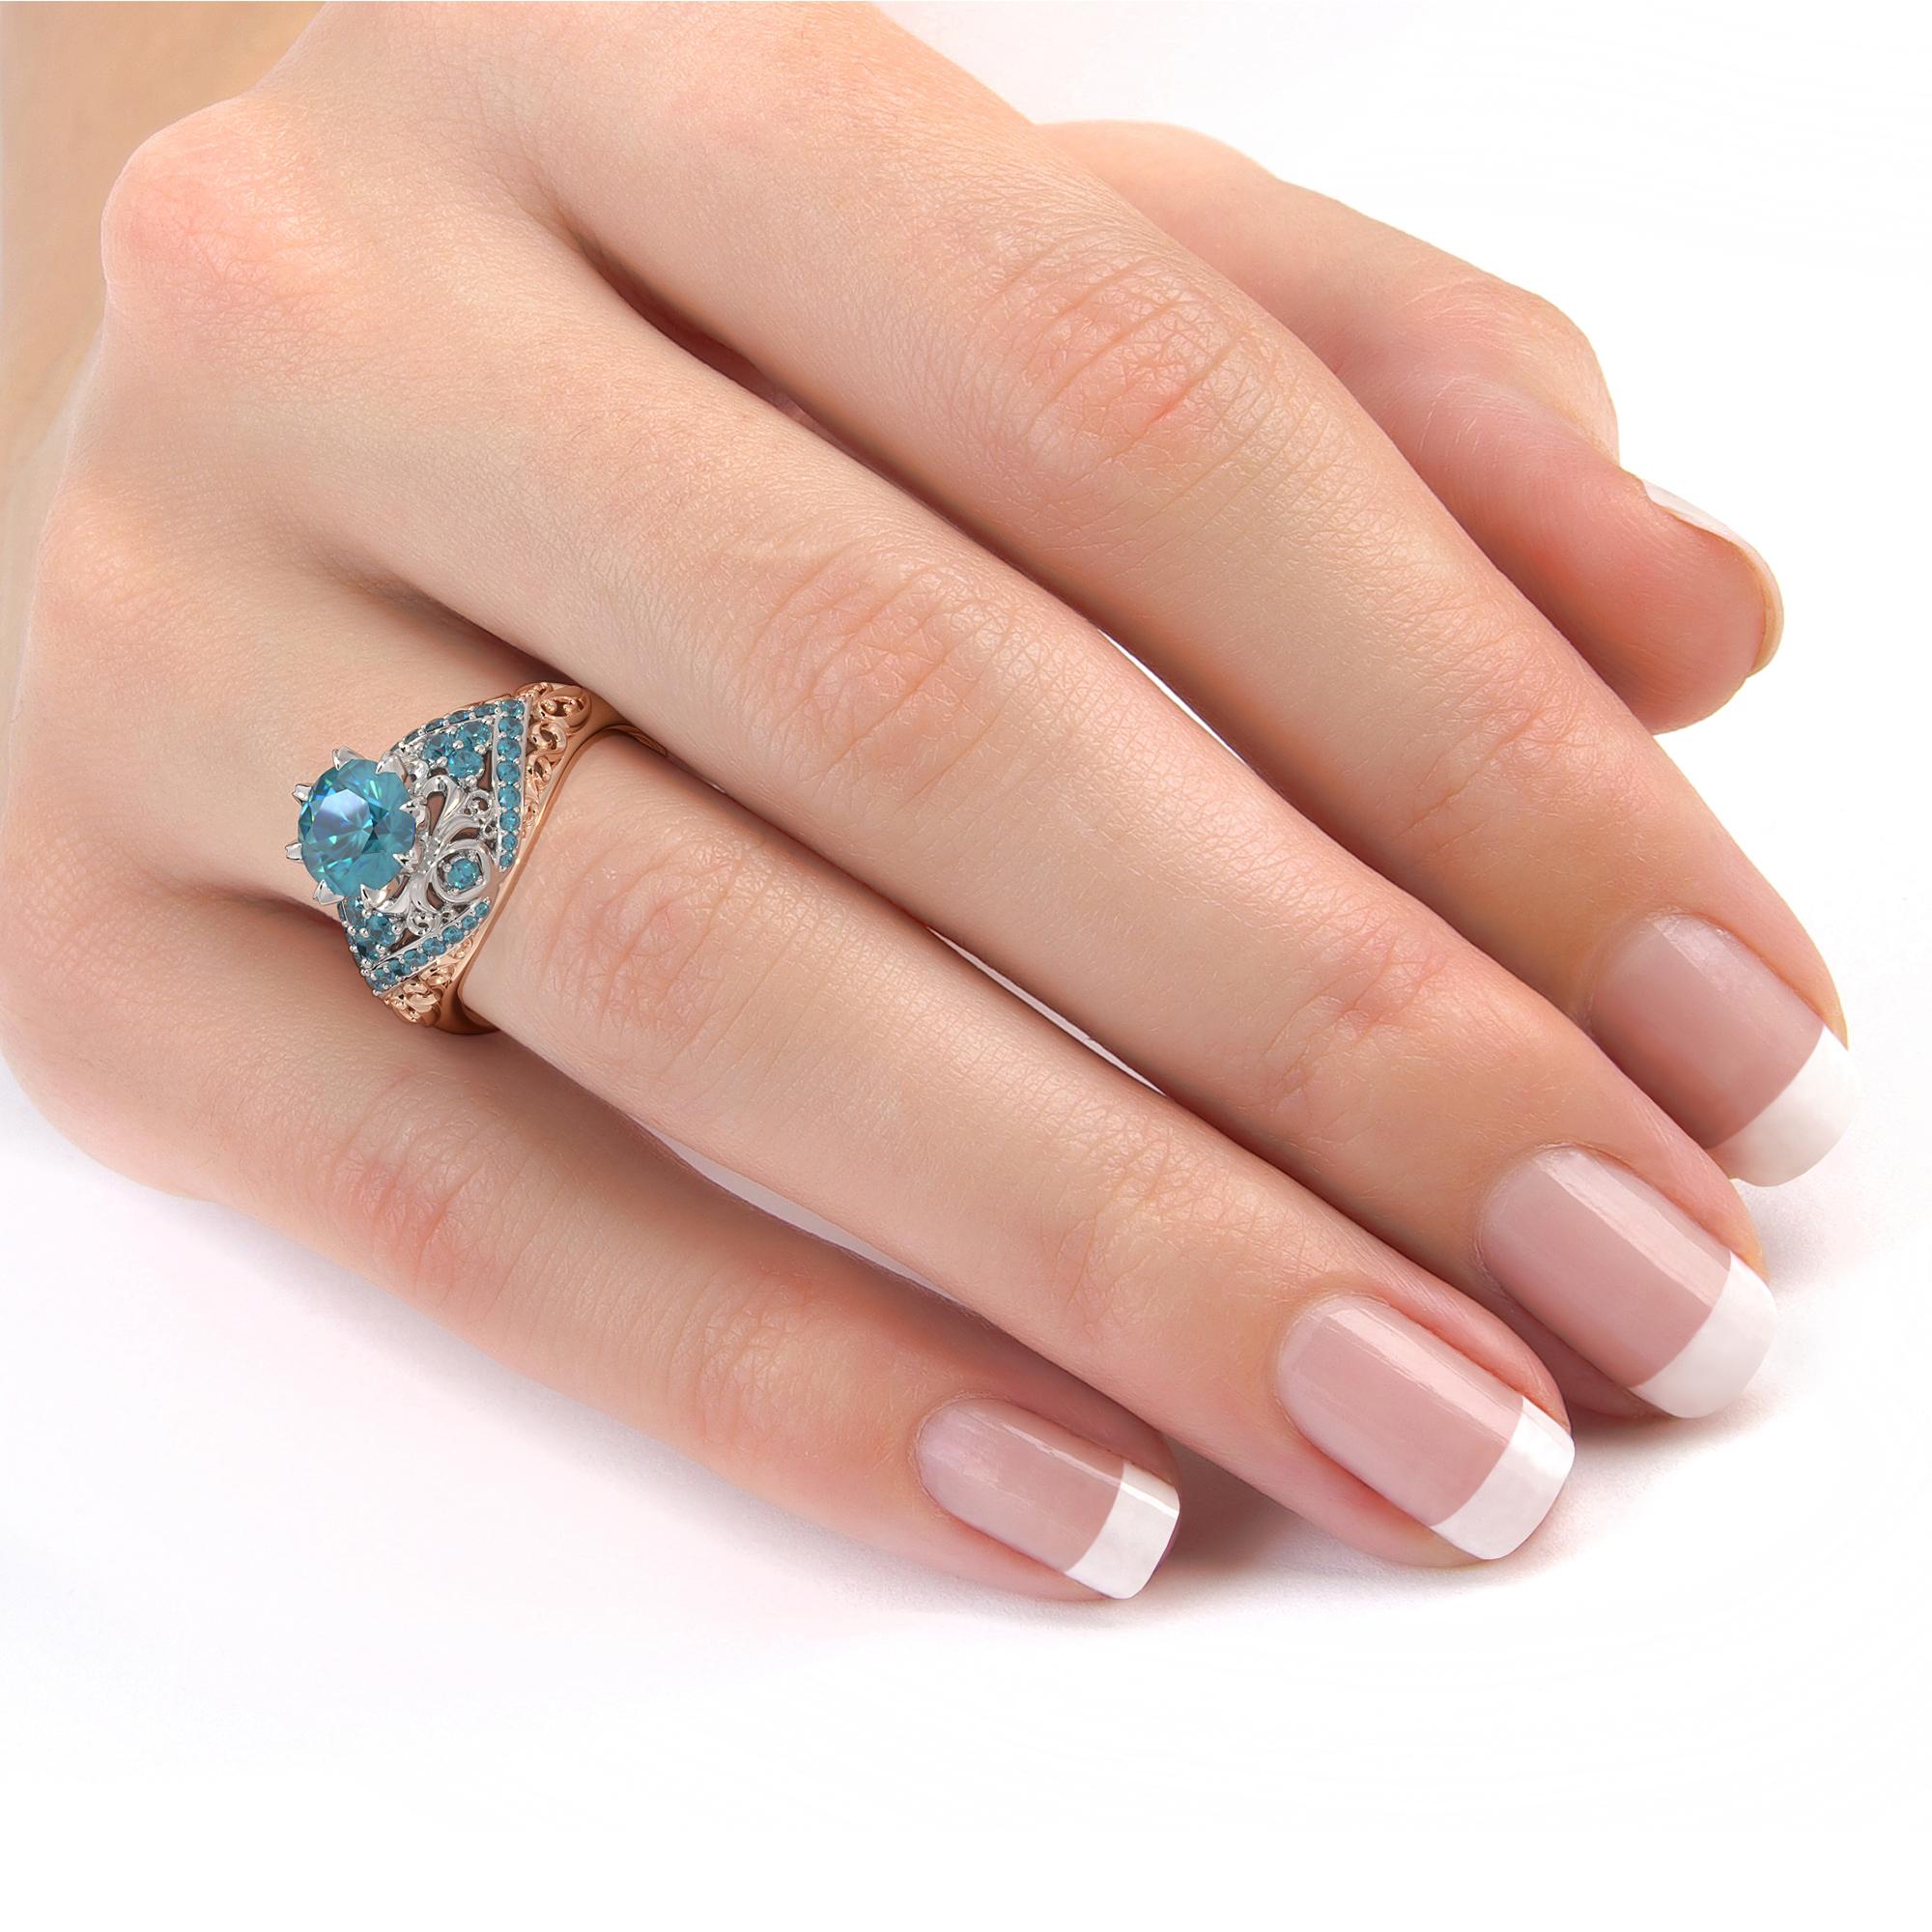 2 Carat Round Blue Diamond Engagement Ring Exalted Fleur De Lis Filigree 2 Tone Gold Ring Diamonds Engagement Ring